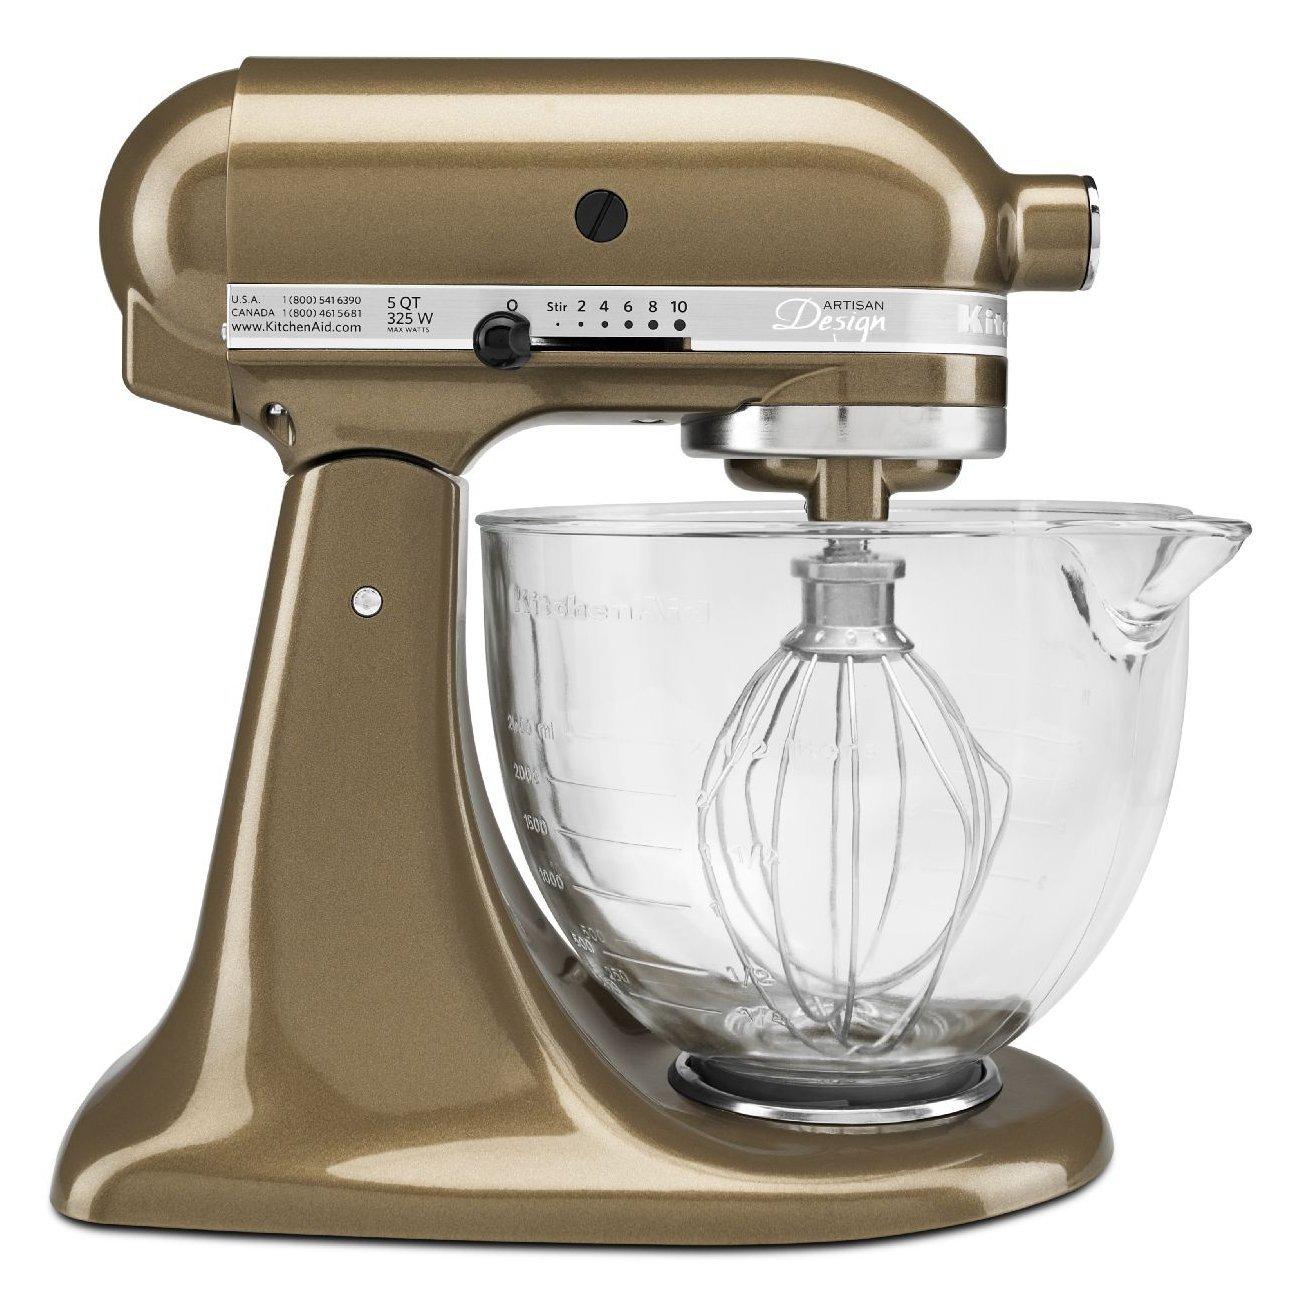 amazon com kitchenaid ksm155gbtf artisan design series with glass rh amazon com